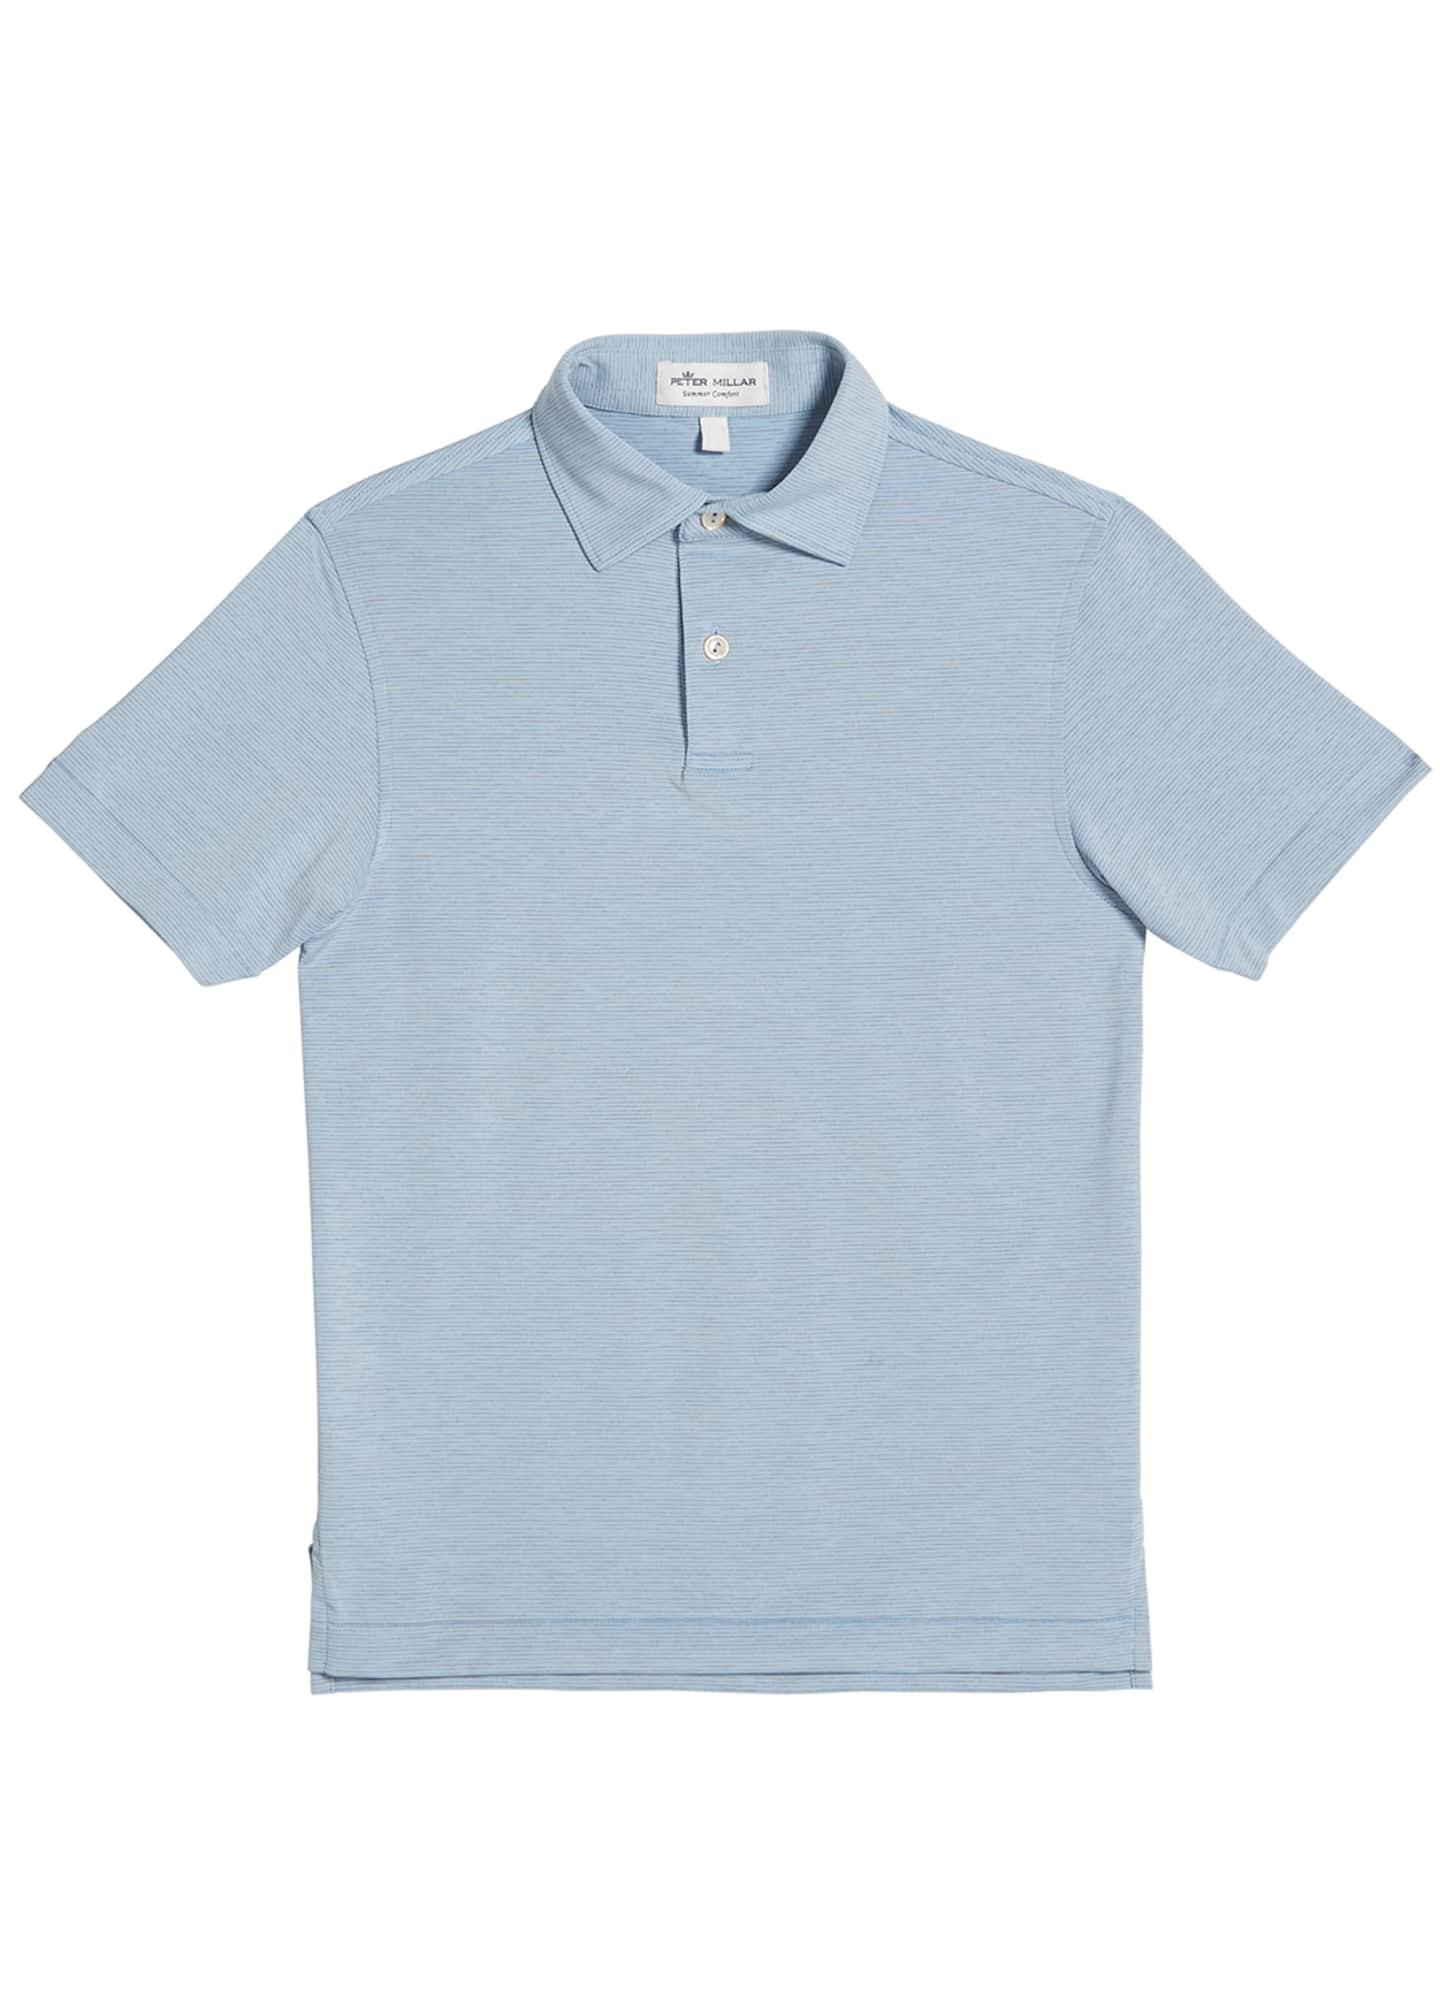 Peter Millar Stretch Jersey Jubilee Striped Polo Shirt,